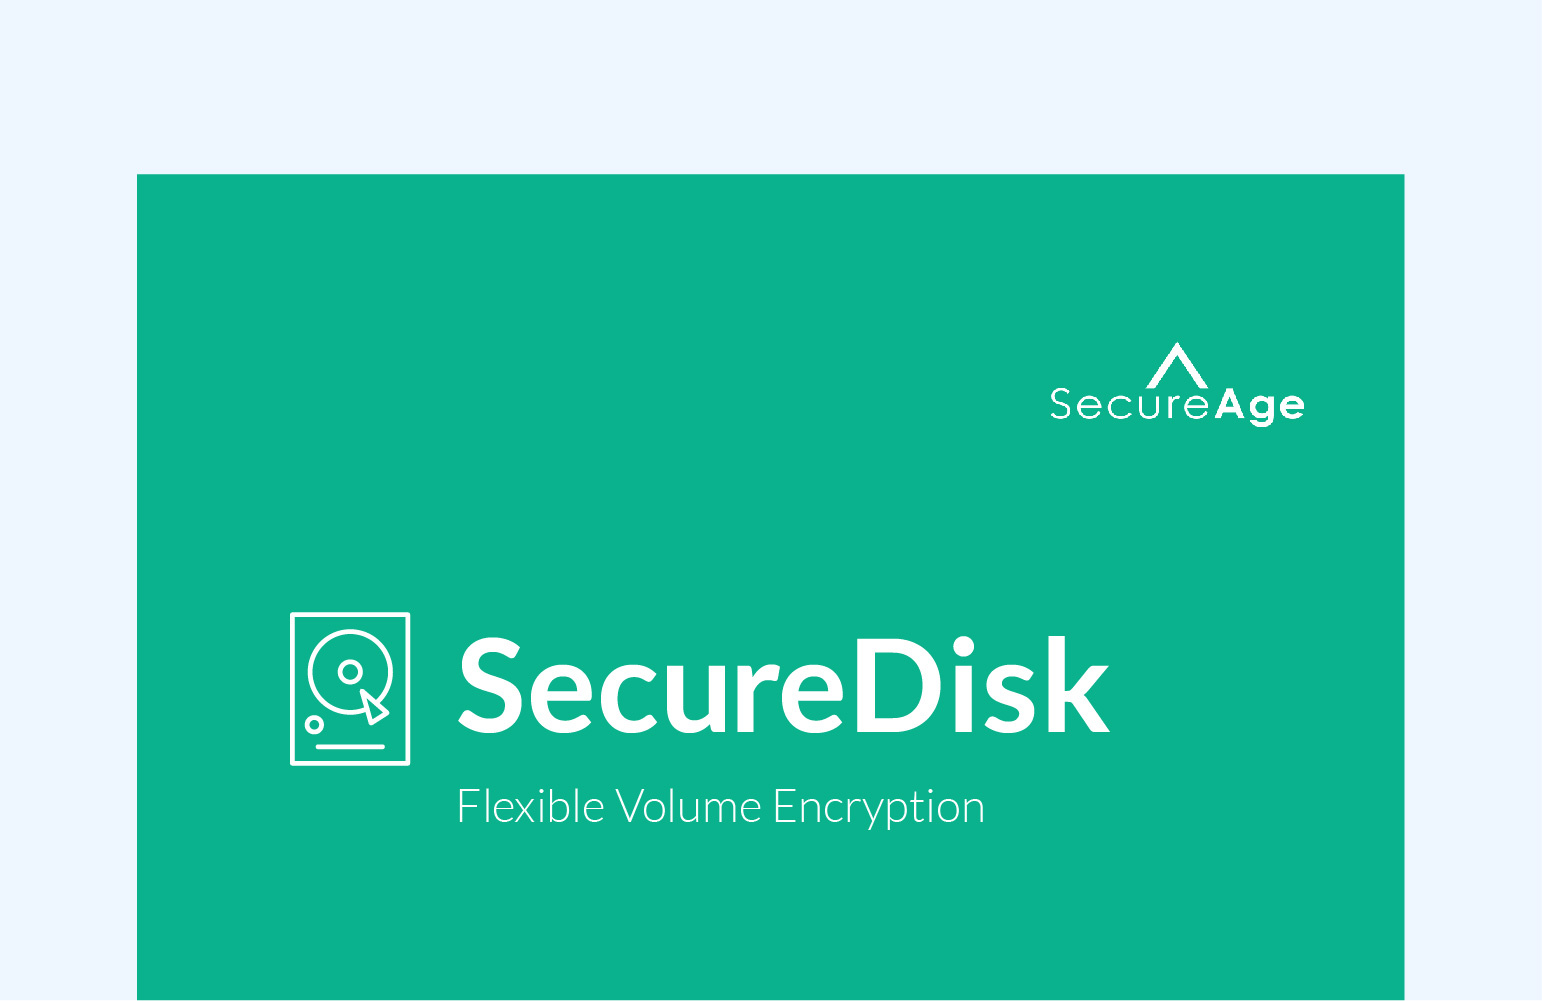 SecureDisk Brochure